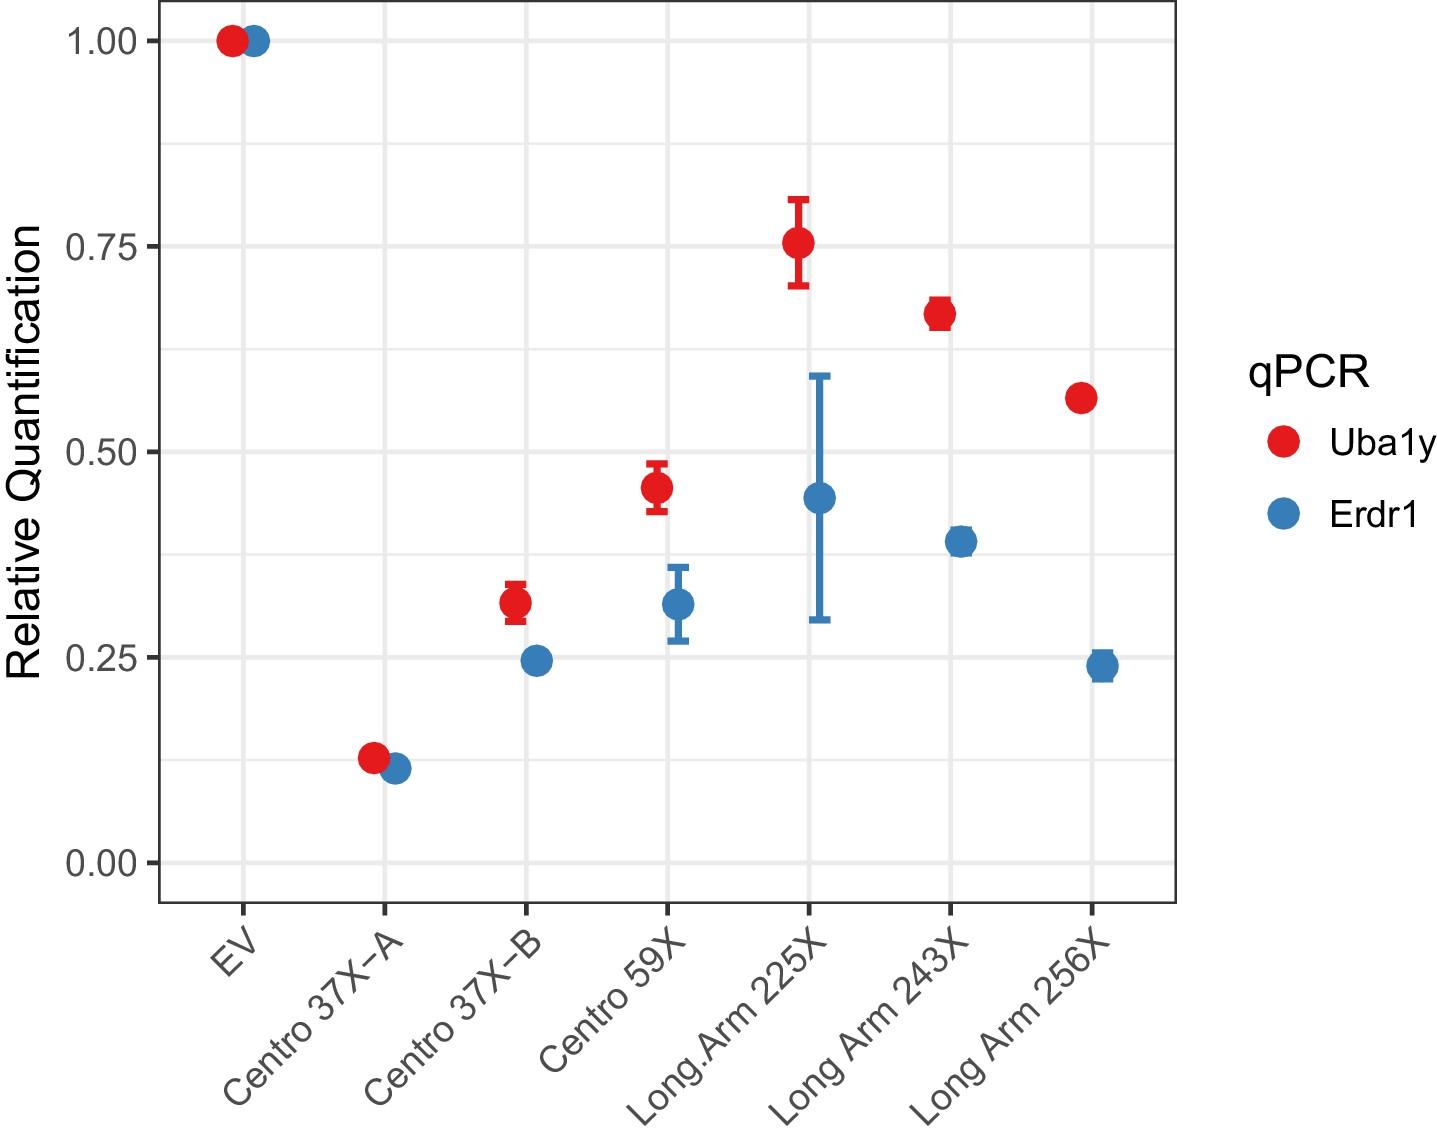 A Y-chromosome shredding gene drive for controlling pest vertebrate